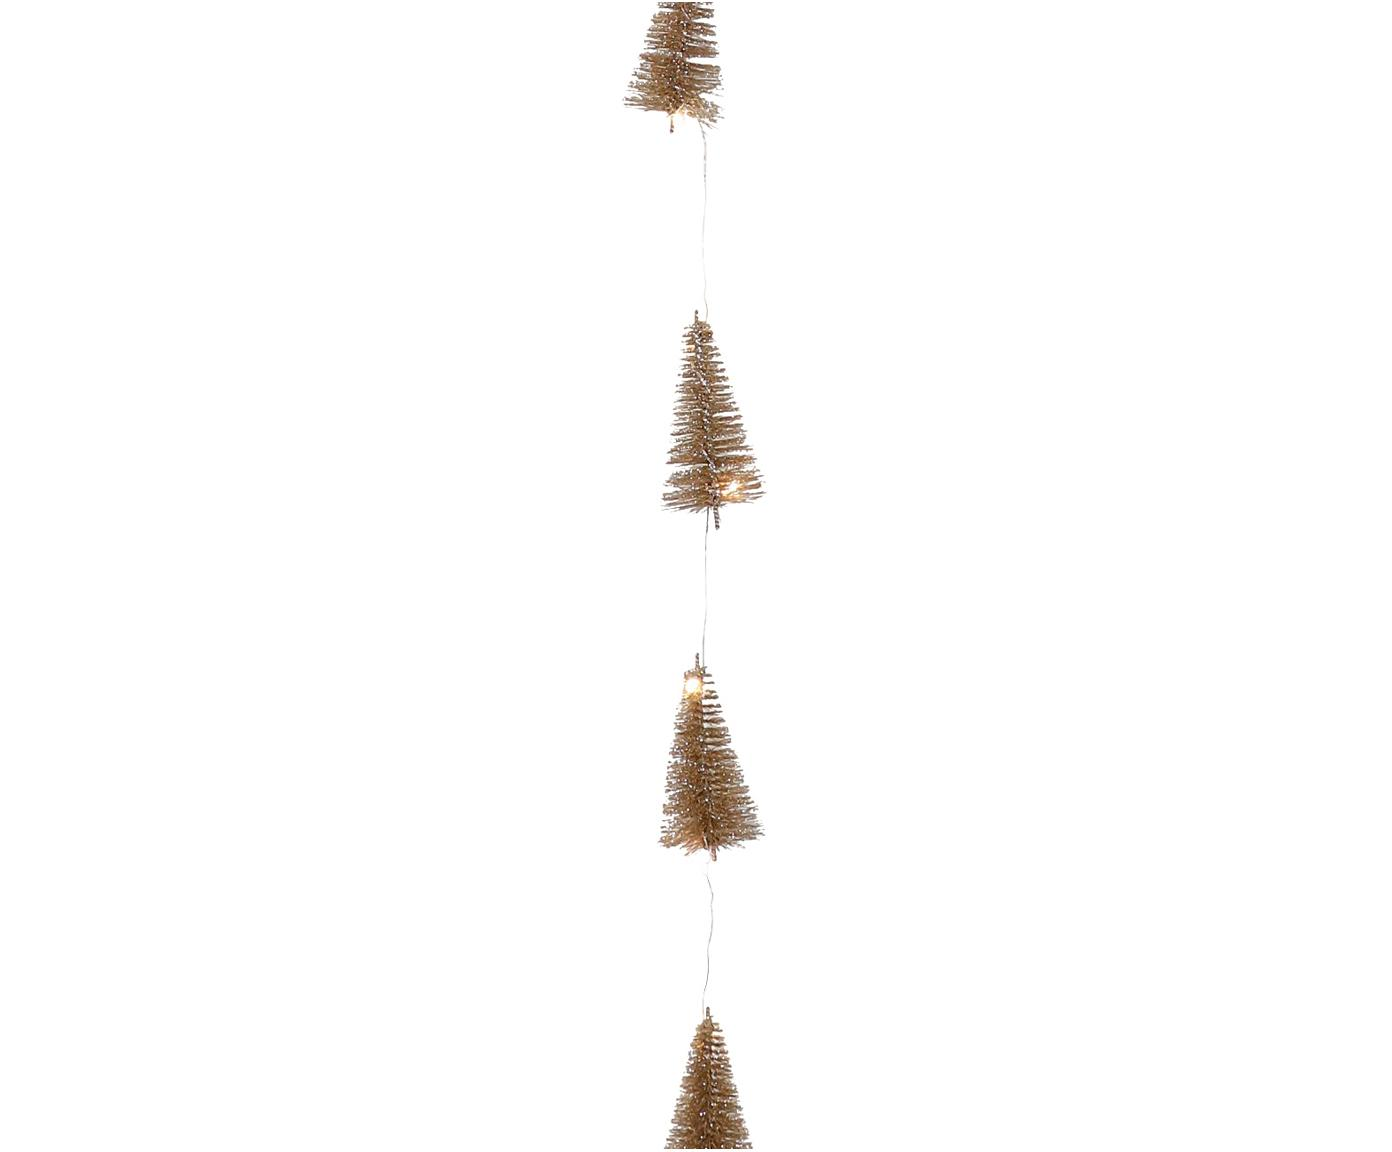 LED Girlande Illumination, Metalldraht, Kunststoff, Glitzer, Goldfarben, L 253 cm